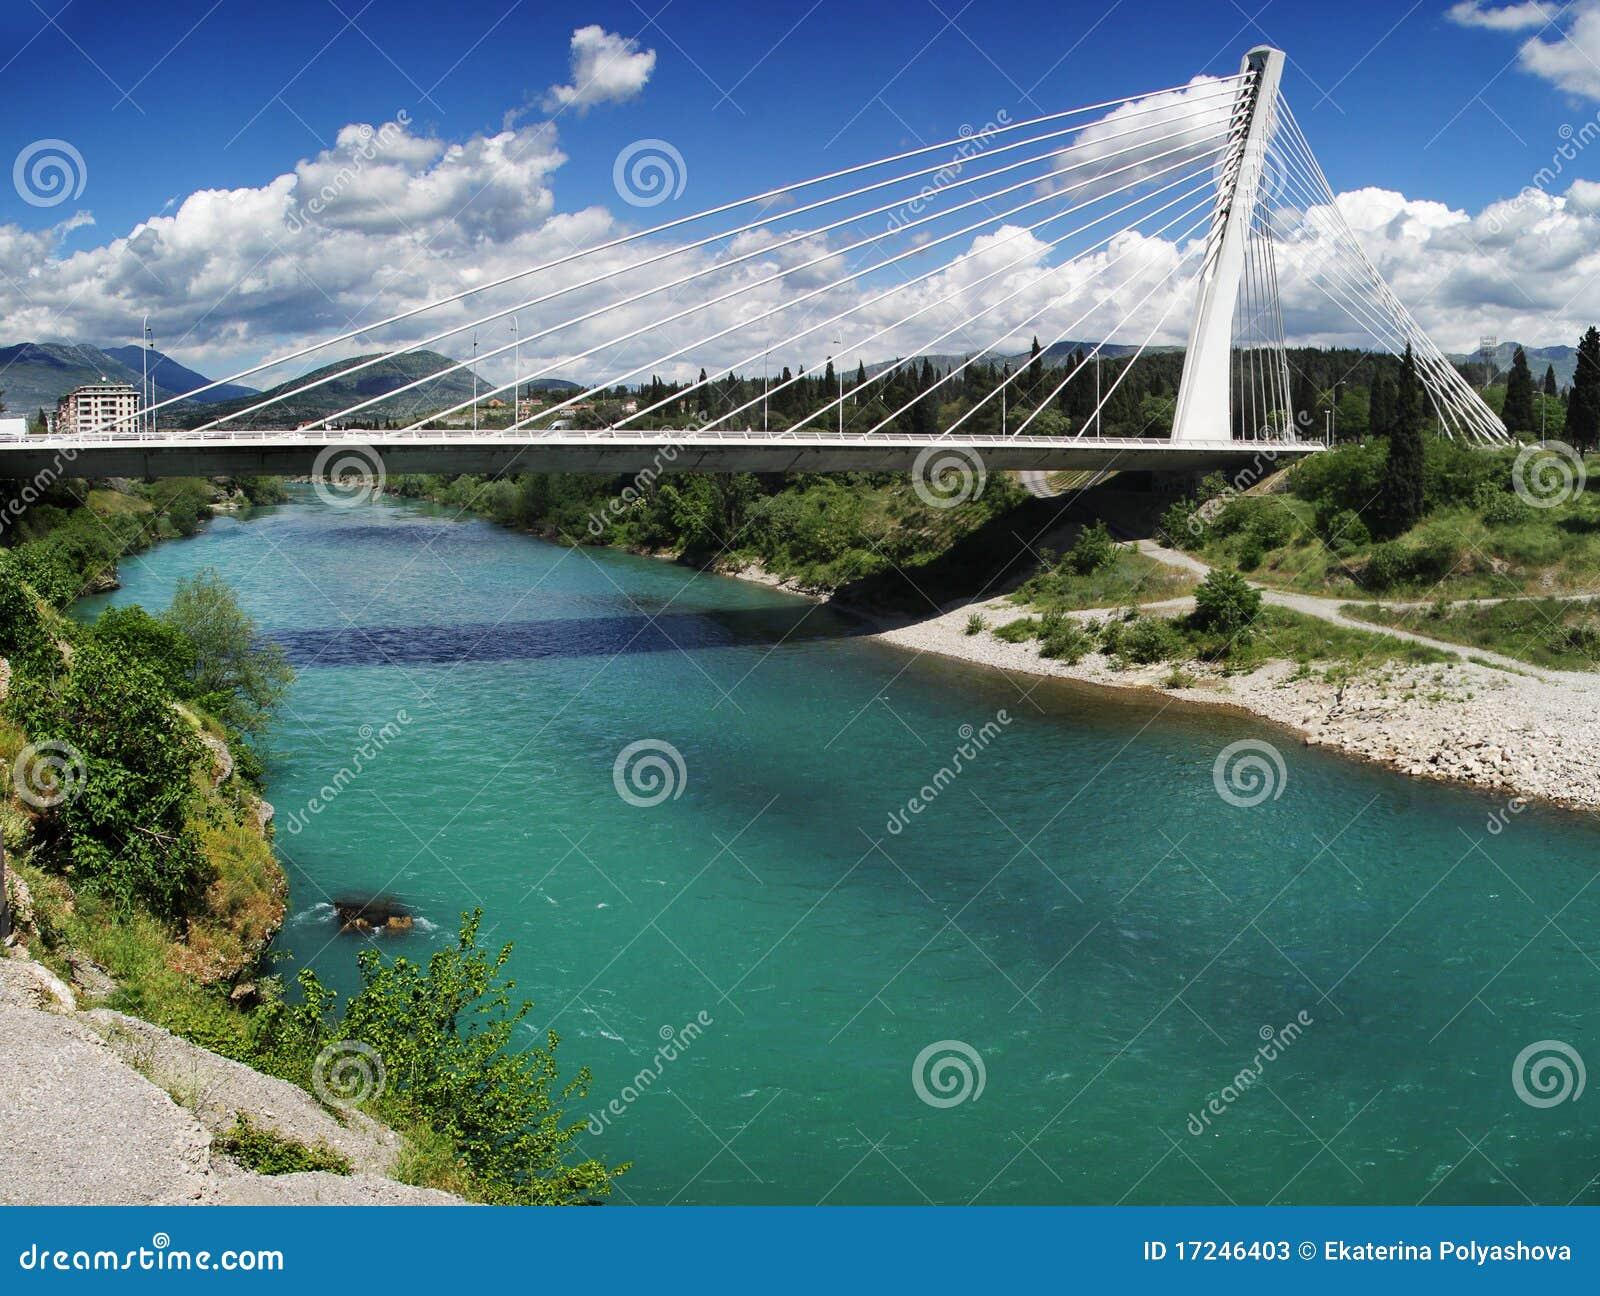 Podgorica, Monténégro. Passerelle de millénium.